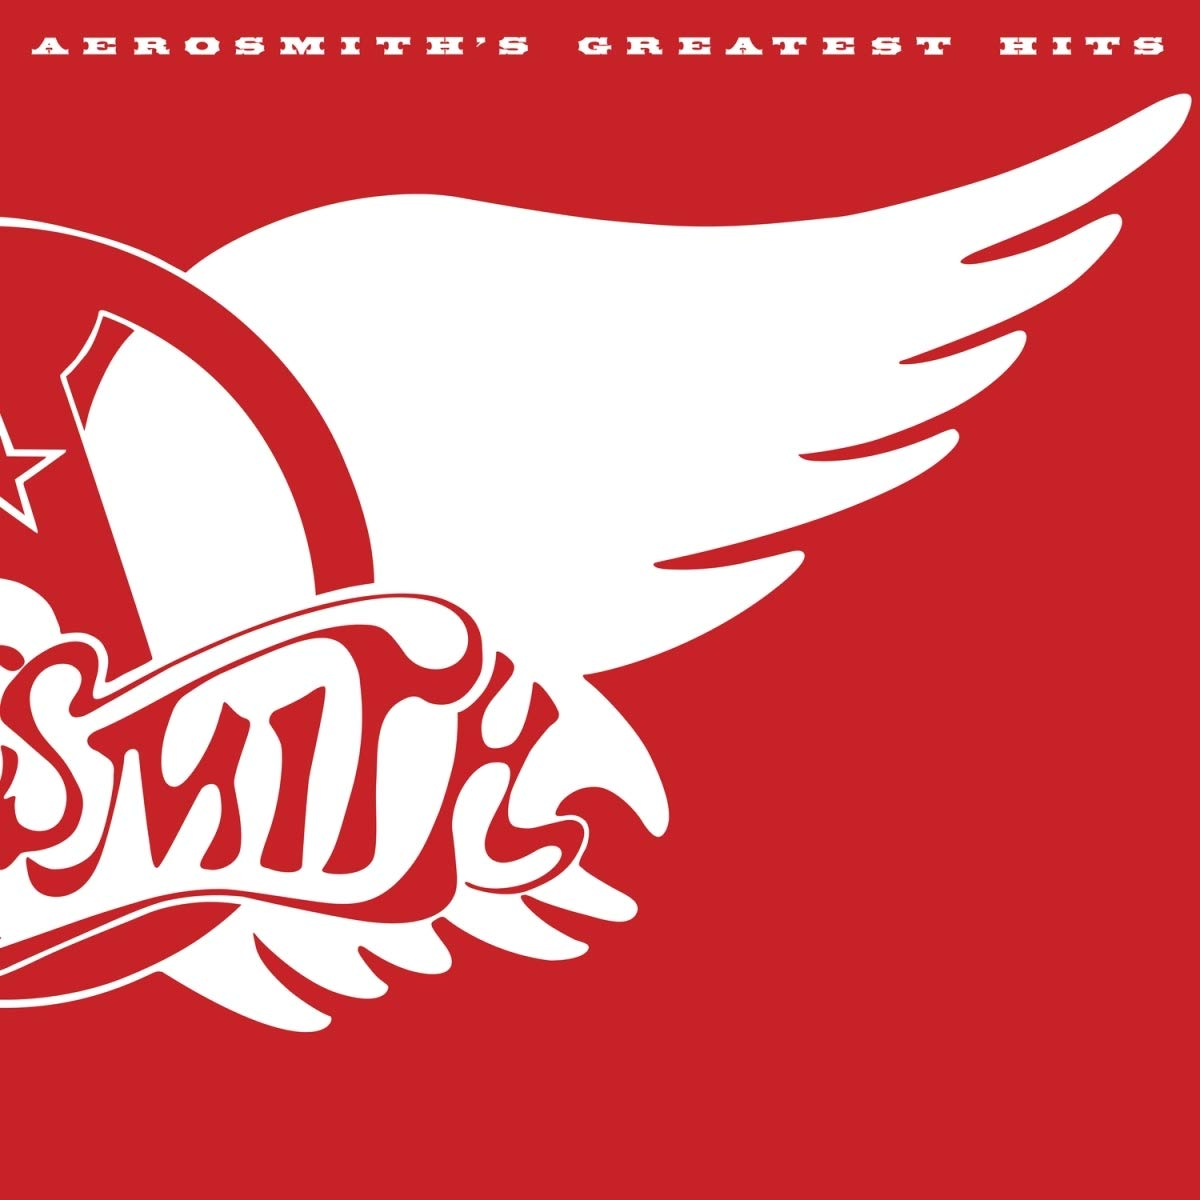 Aerosmith's Greatest Hits - Vinyl